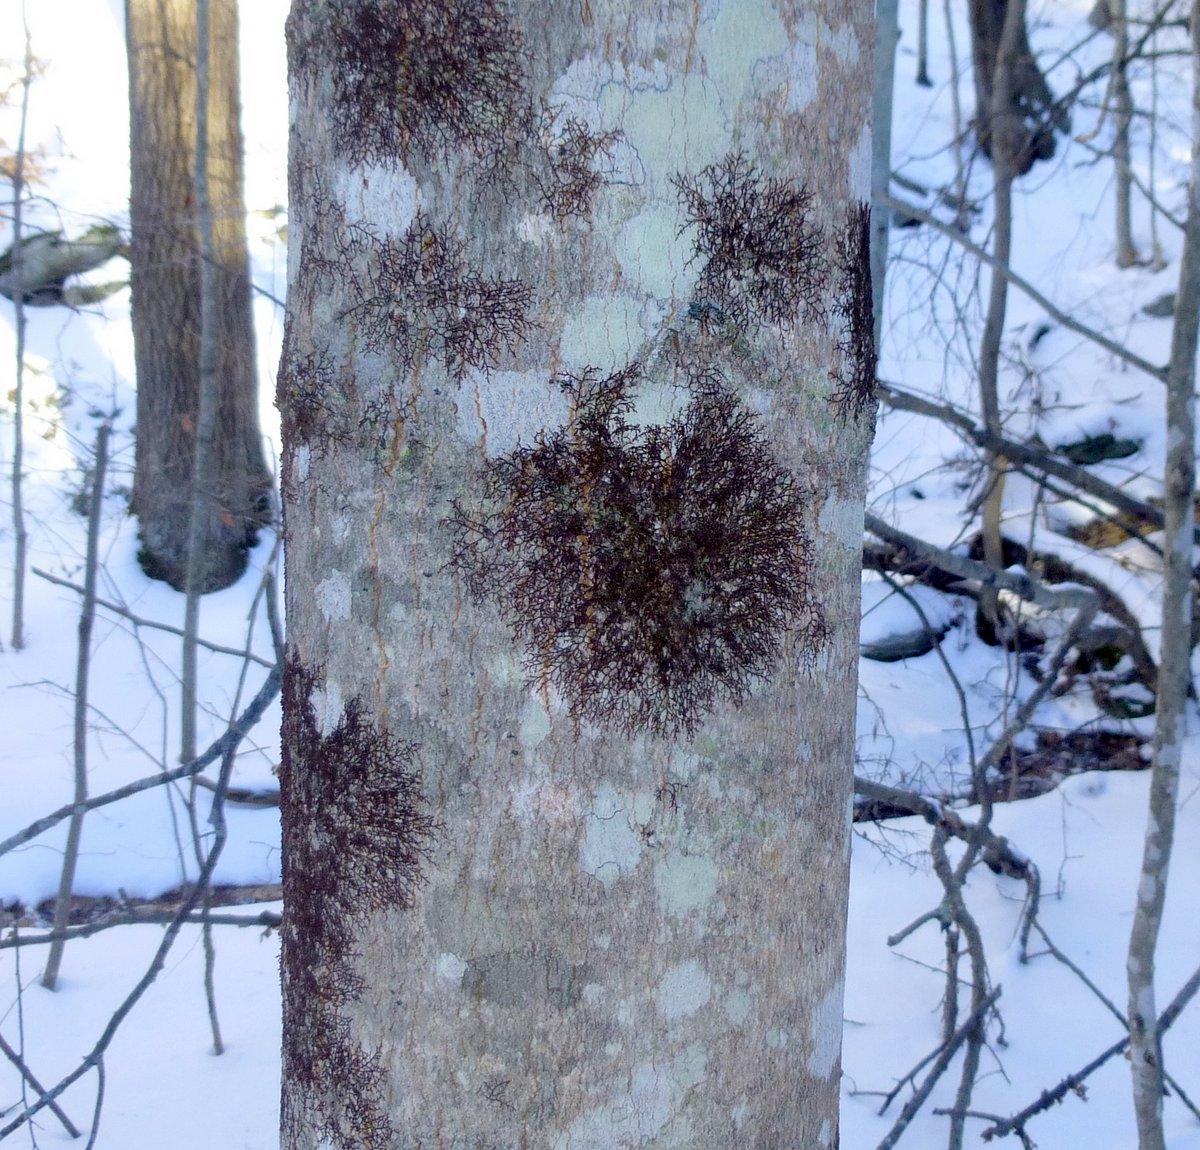 6. Liverwort on Maple